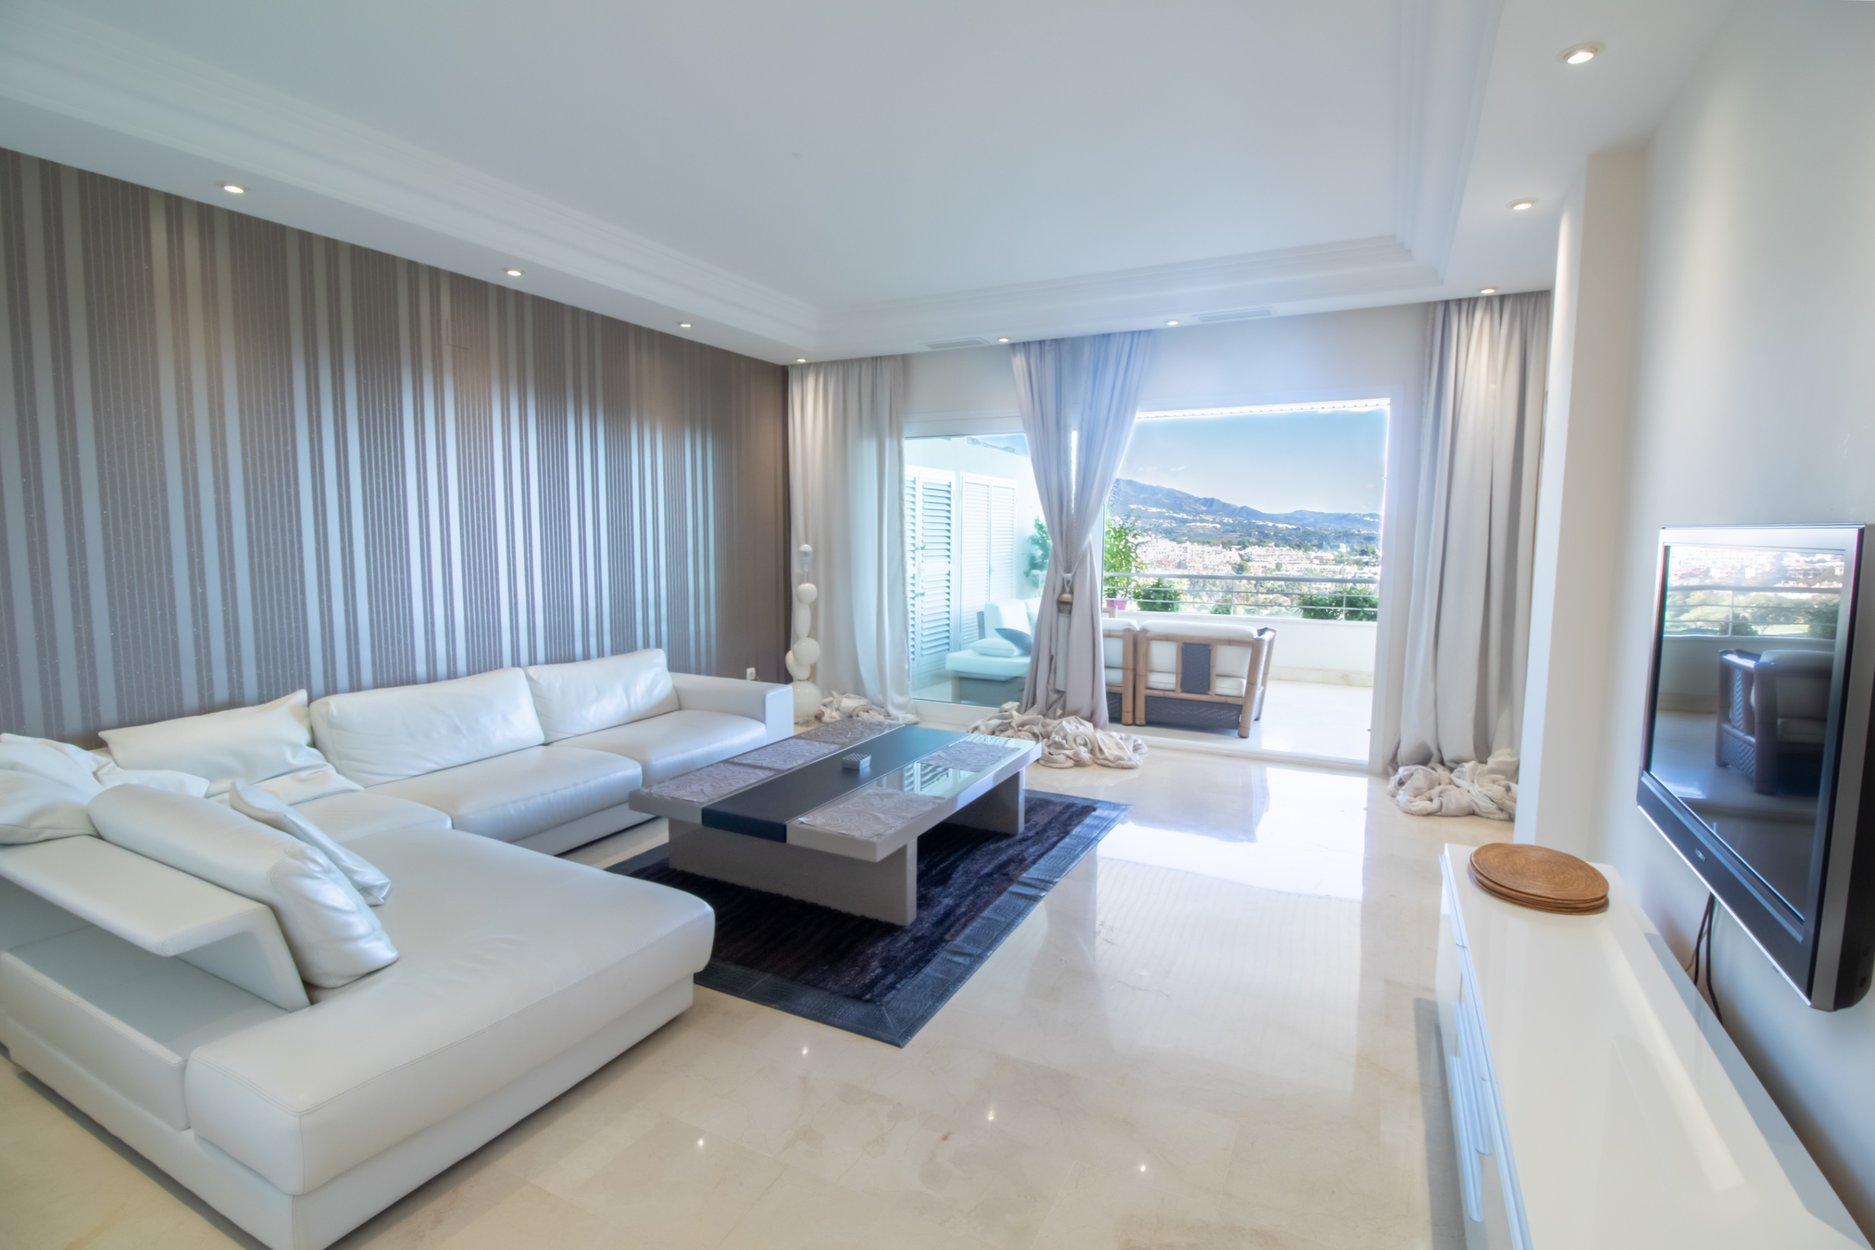 aaa2 bedroom Apartment in Nueva Andalucia, Marbella | M370167